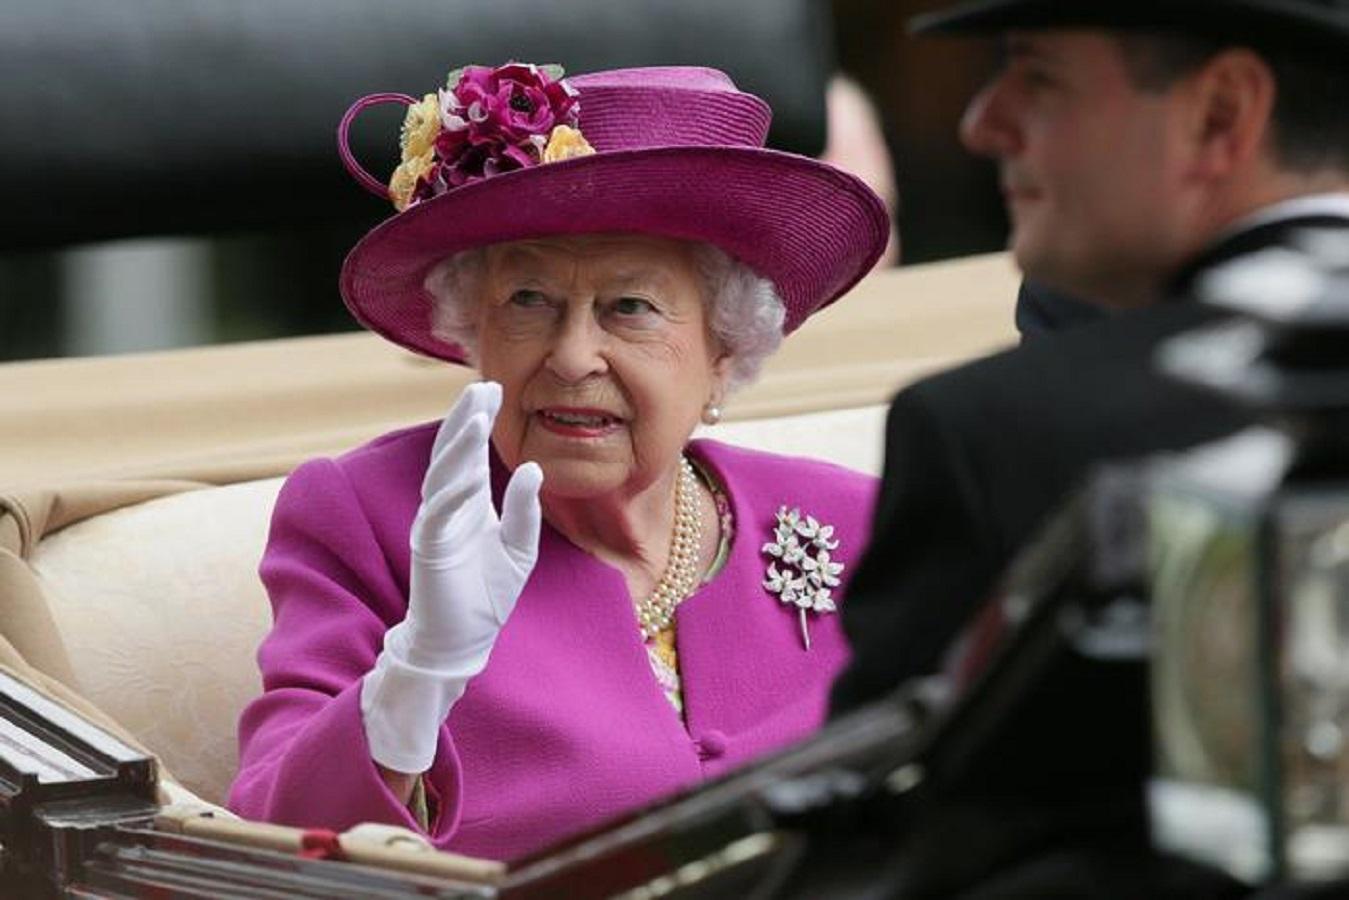 La regina Elisabetta ha preso una decisione radicale contro Harvey Weinstein